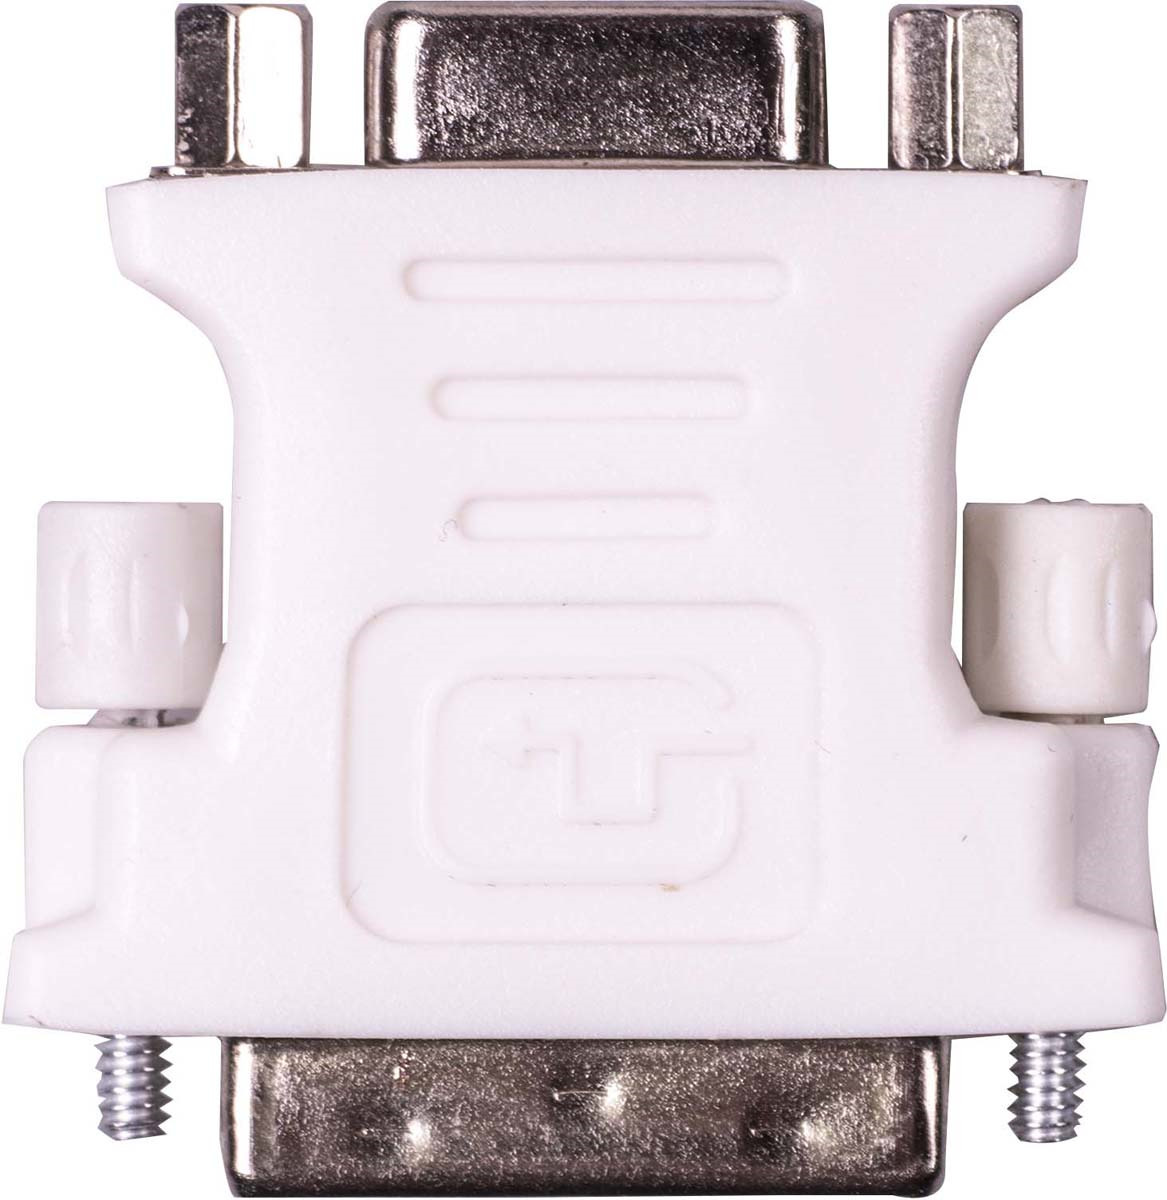 Кабель Ritmix RCC-070 DVI - VGA, 15119601, белый цена и фото